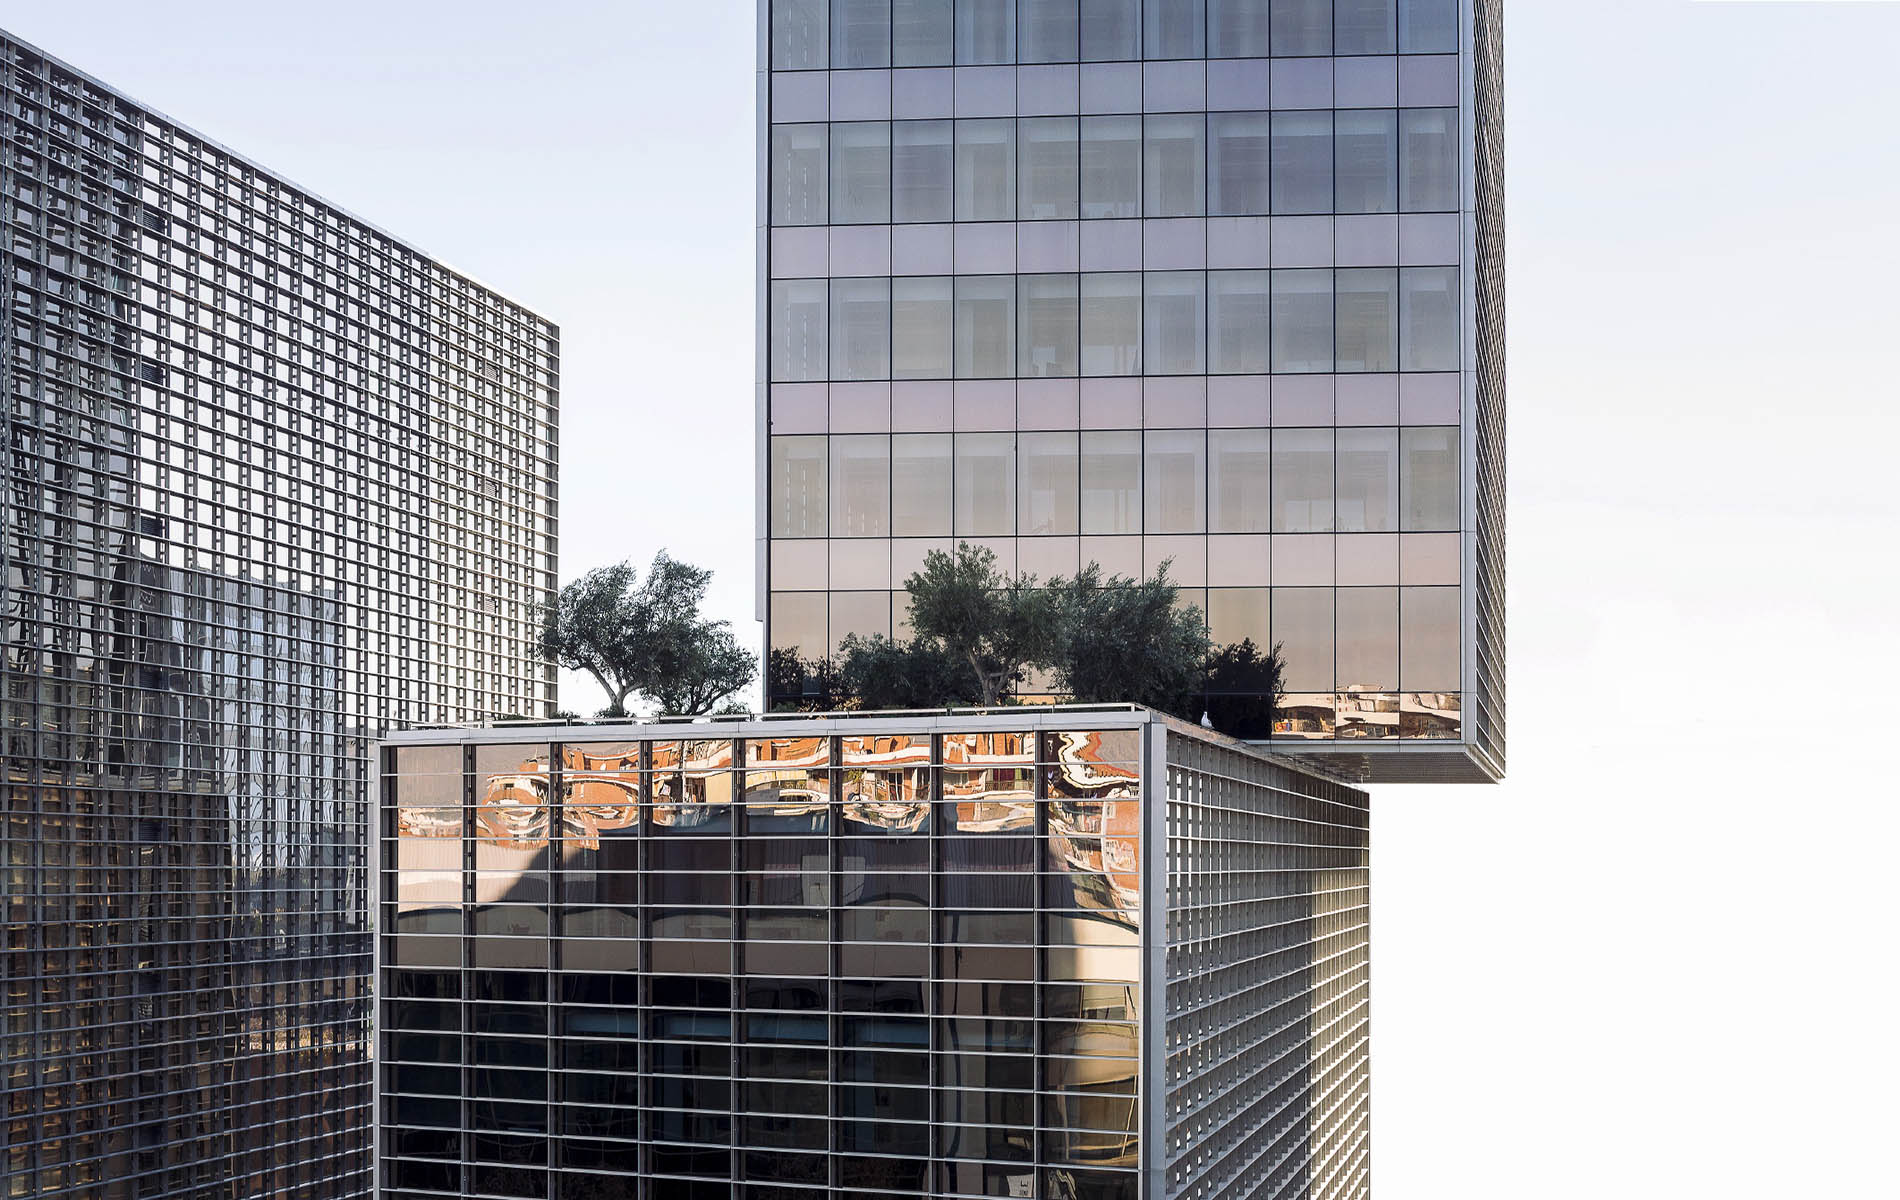 architecturephotography ,architecturelovers ,rafaelvargas photo,rafaelvargas.com, gca architects,cuatrecasas lawyers,barcelona